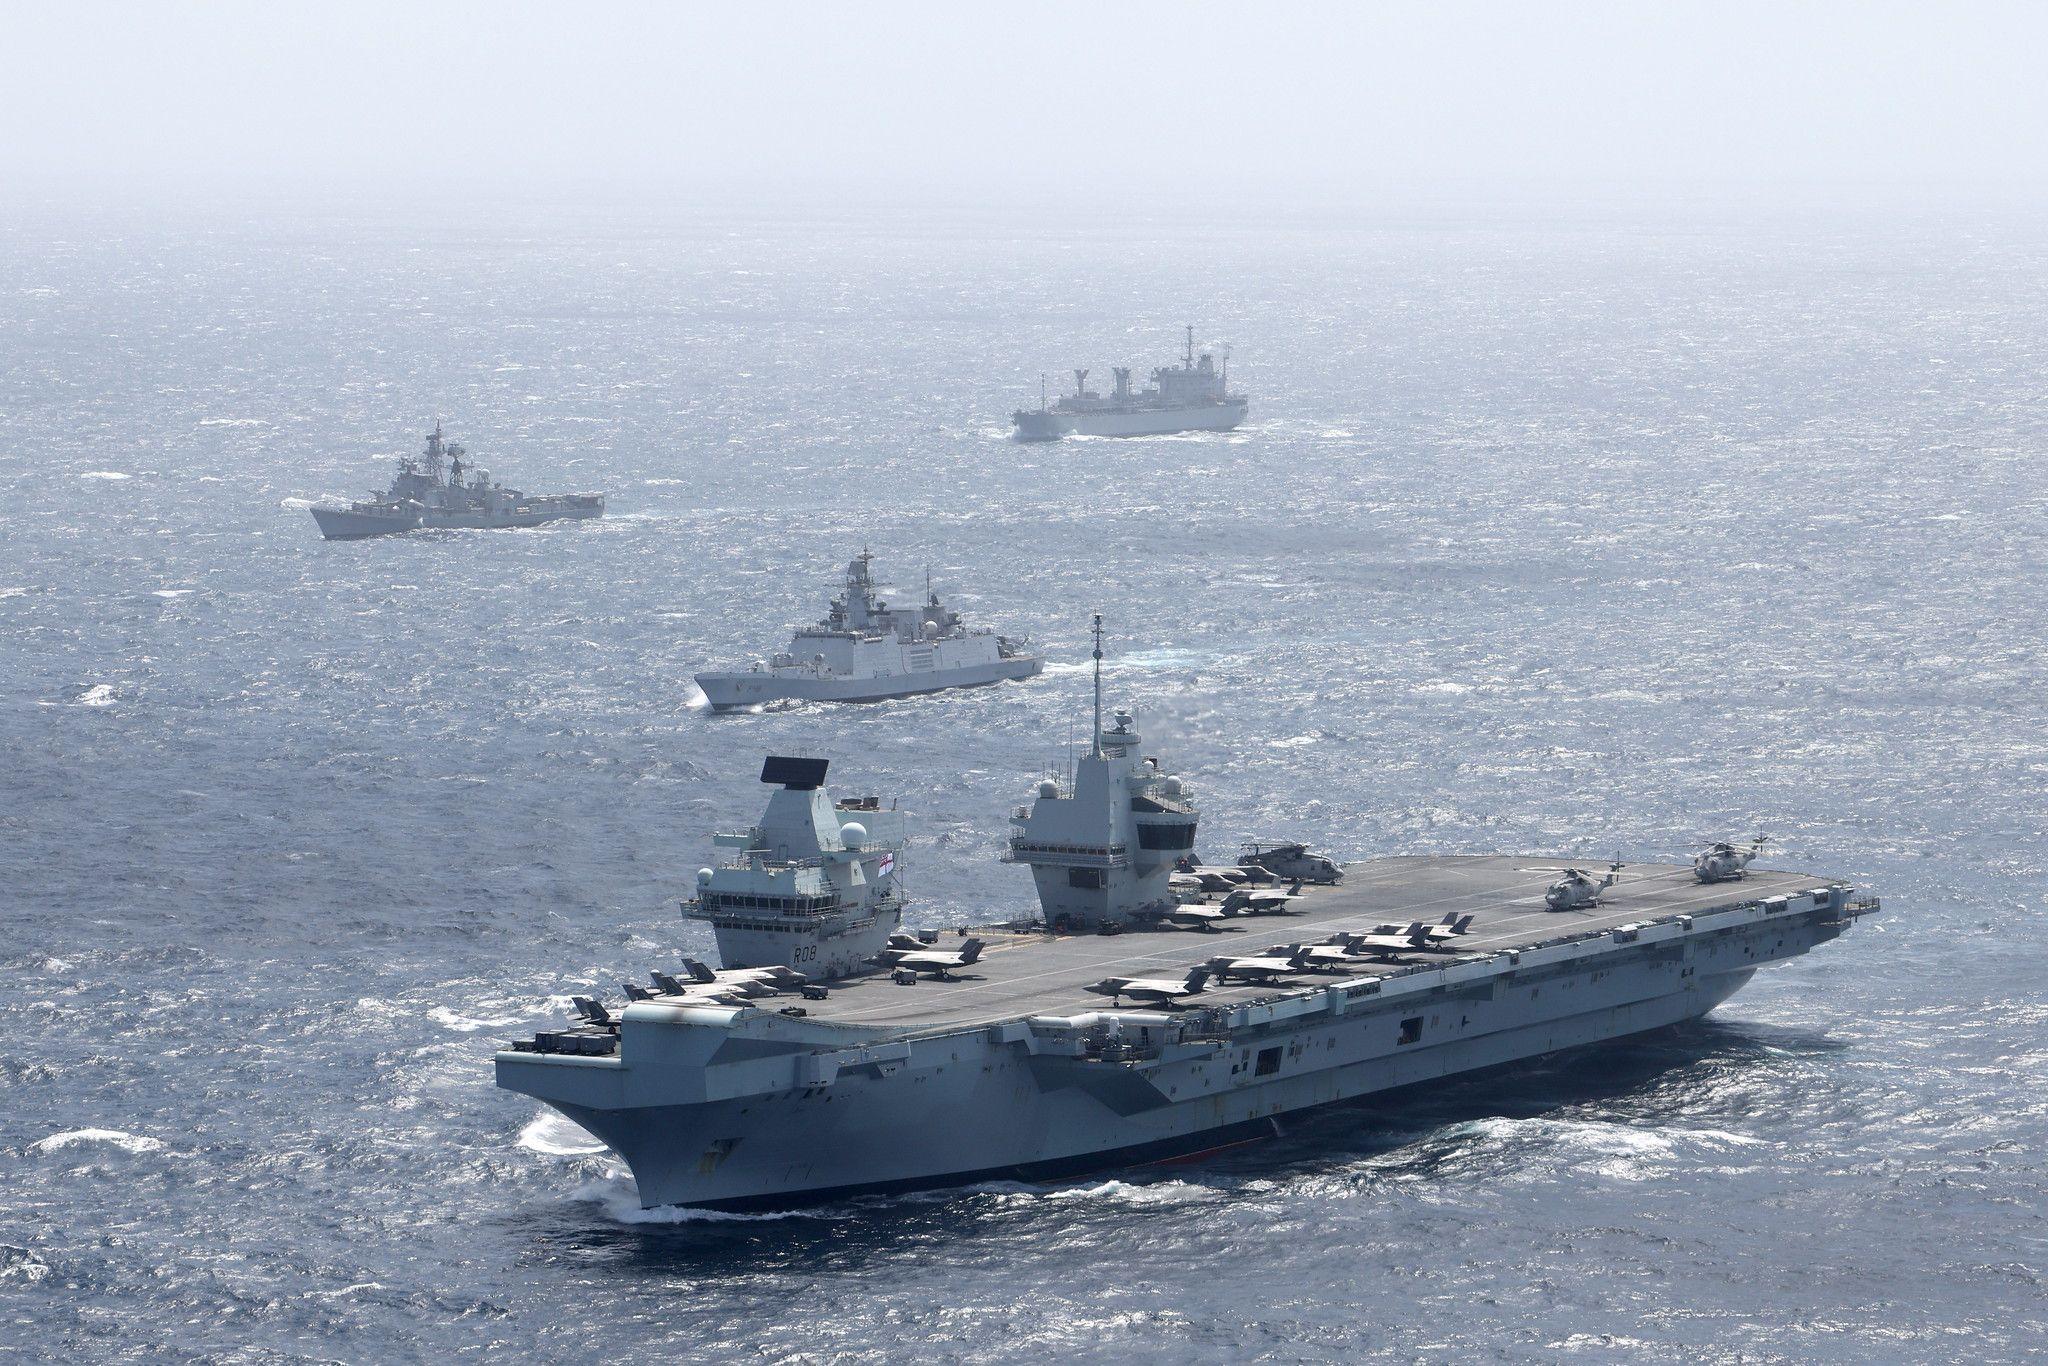 UK Carrier Strike Group flagship HMS Queen Elizabeth to arrive in Japan